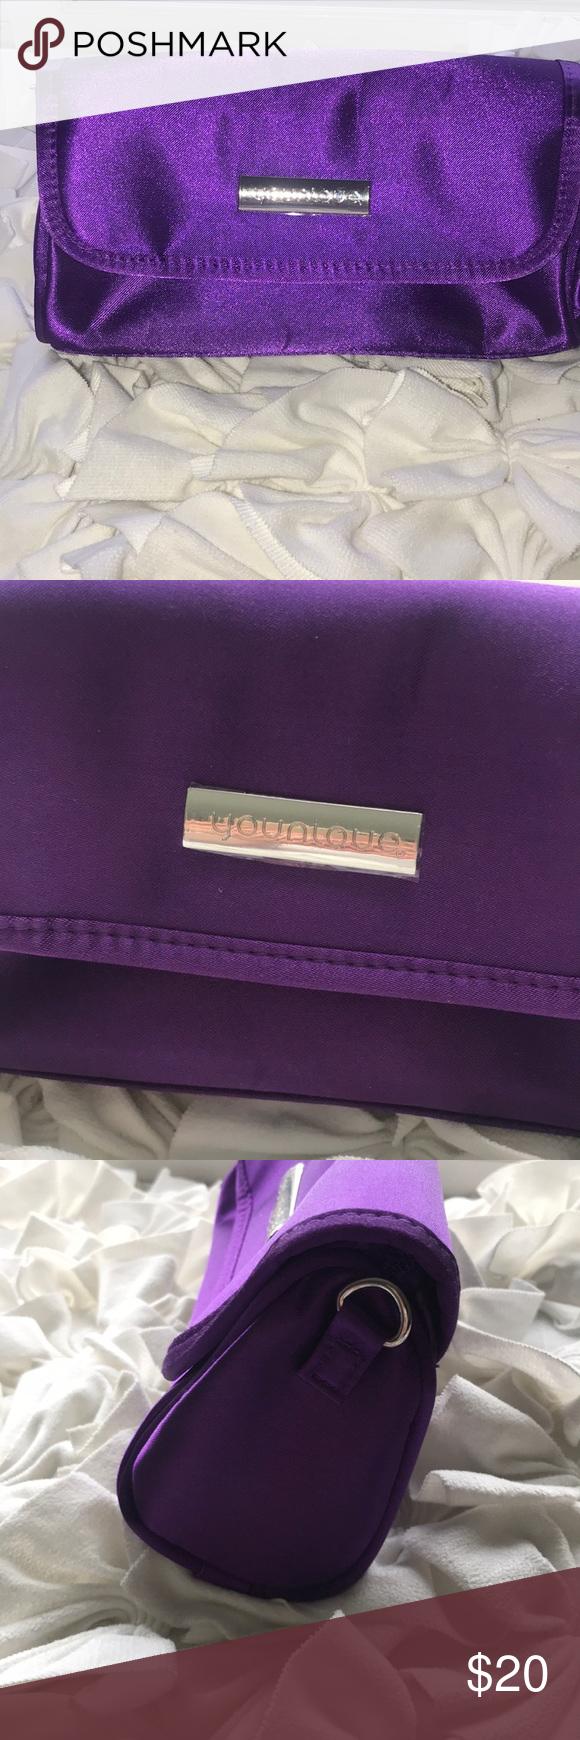 Younique makeup bag Purple bags, Purple bag, Makeup bag